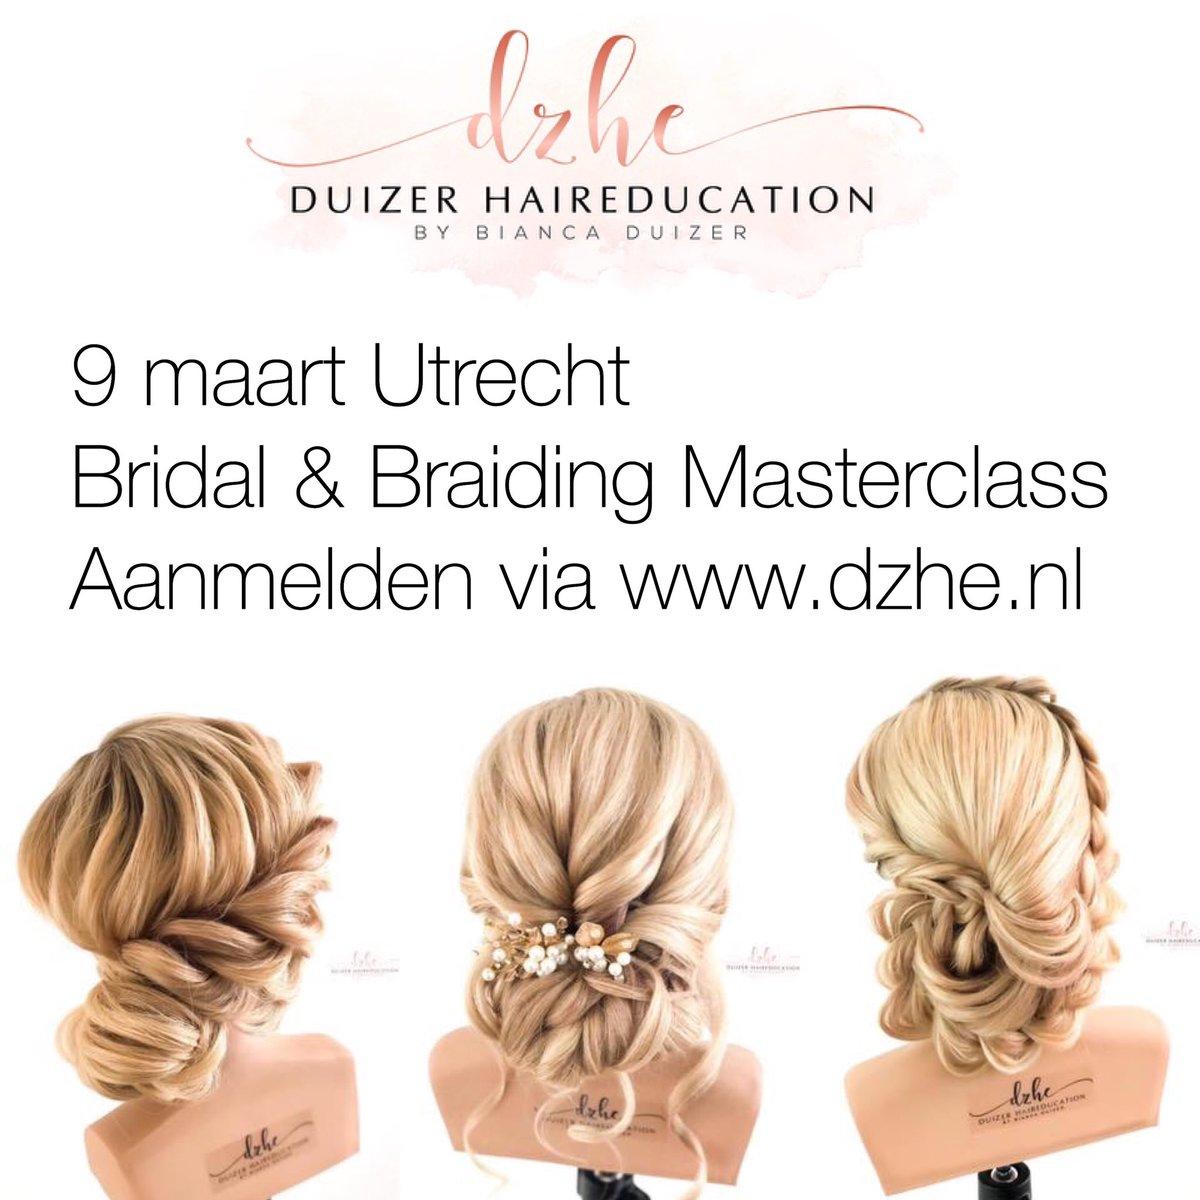 Bridal & Braiding Masterclass 9 maart Utrecht http://www.dzhe.nl  #biancaduizer #hairstylist #bridalhair #DZHE #updo #hairbraids #haireducation #haireducator #salontraining #braidinglife #modernsalon  #hairdo #bruidskapselcursus #bridalhairstylistpic.twitter.com/ZBTR3IXah3